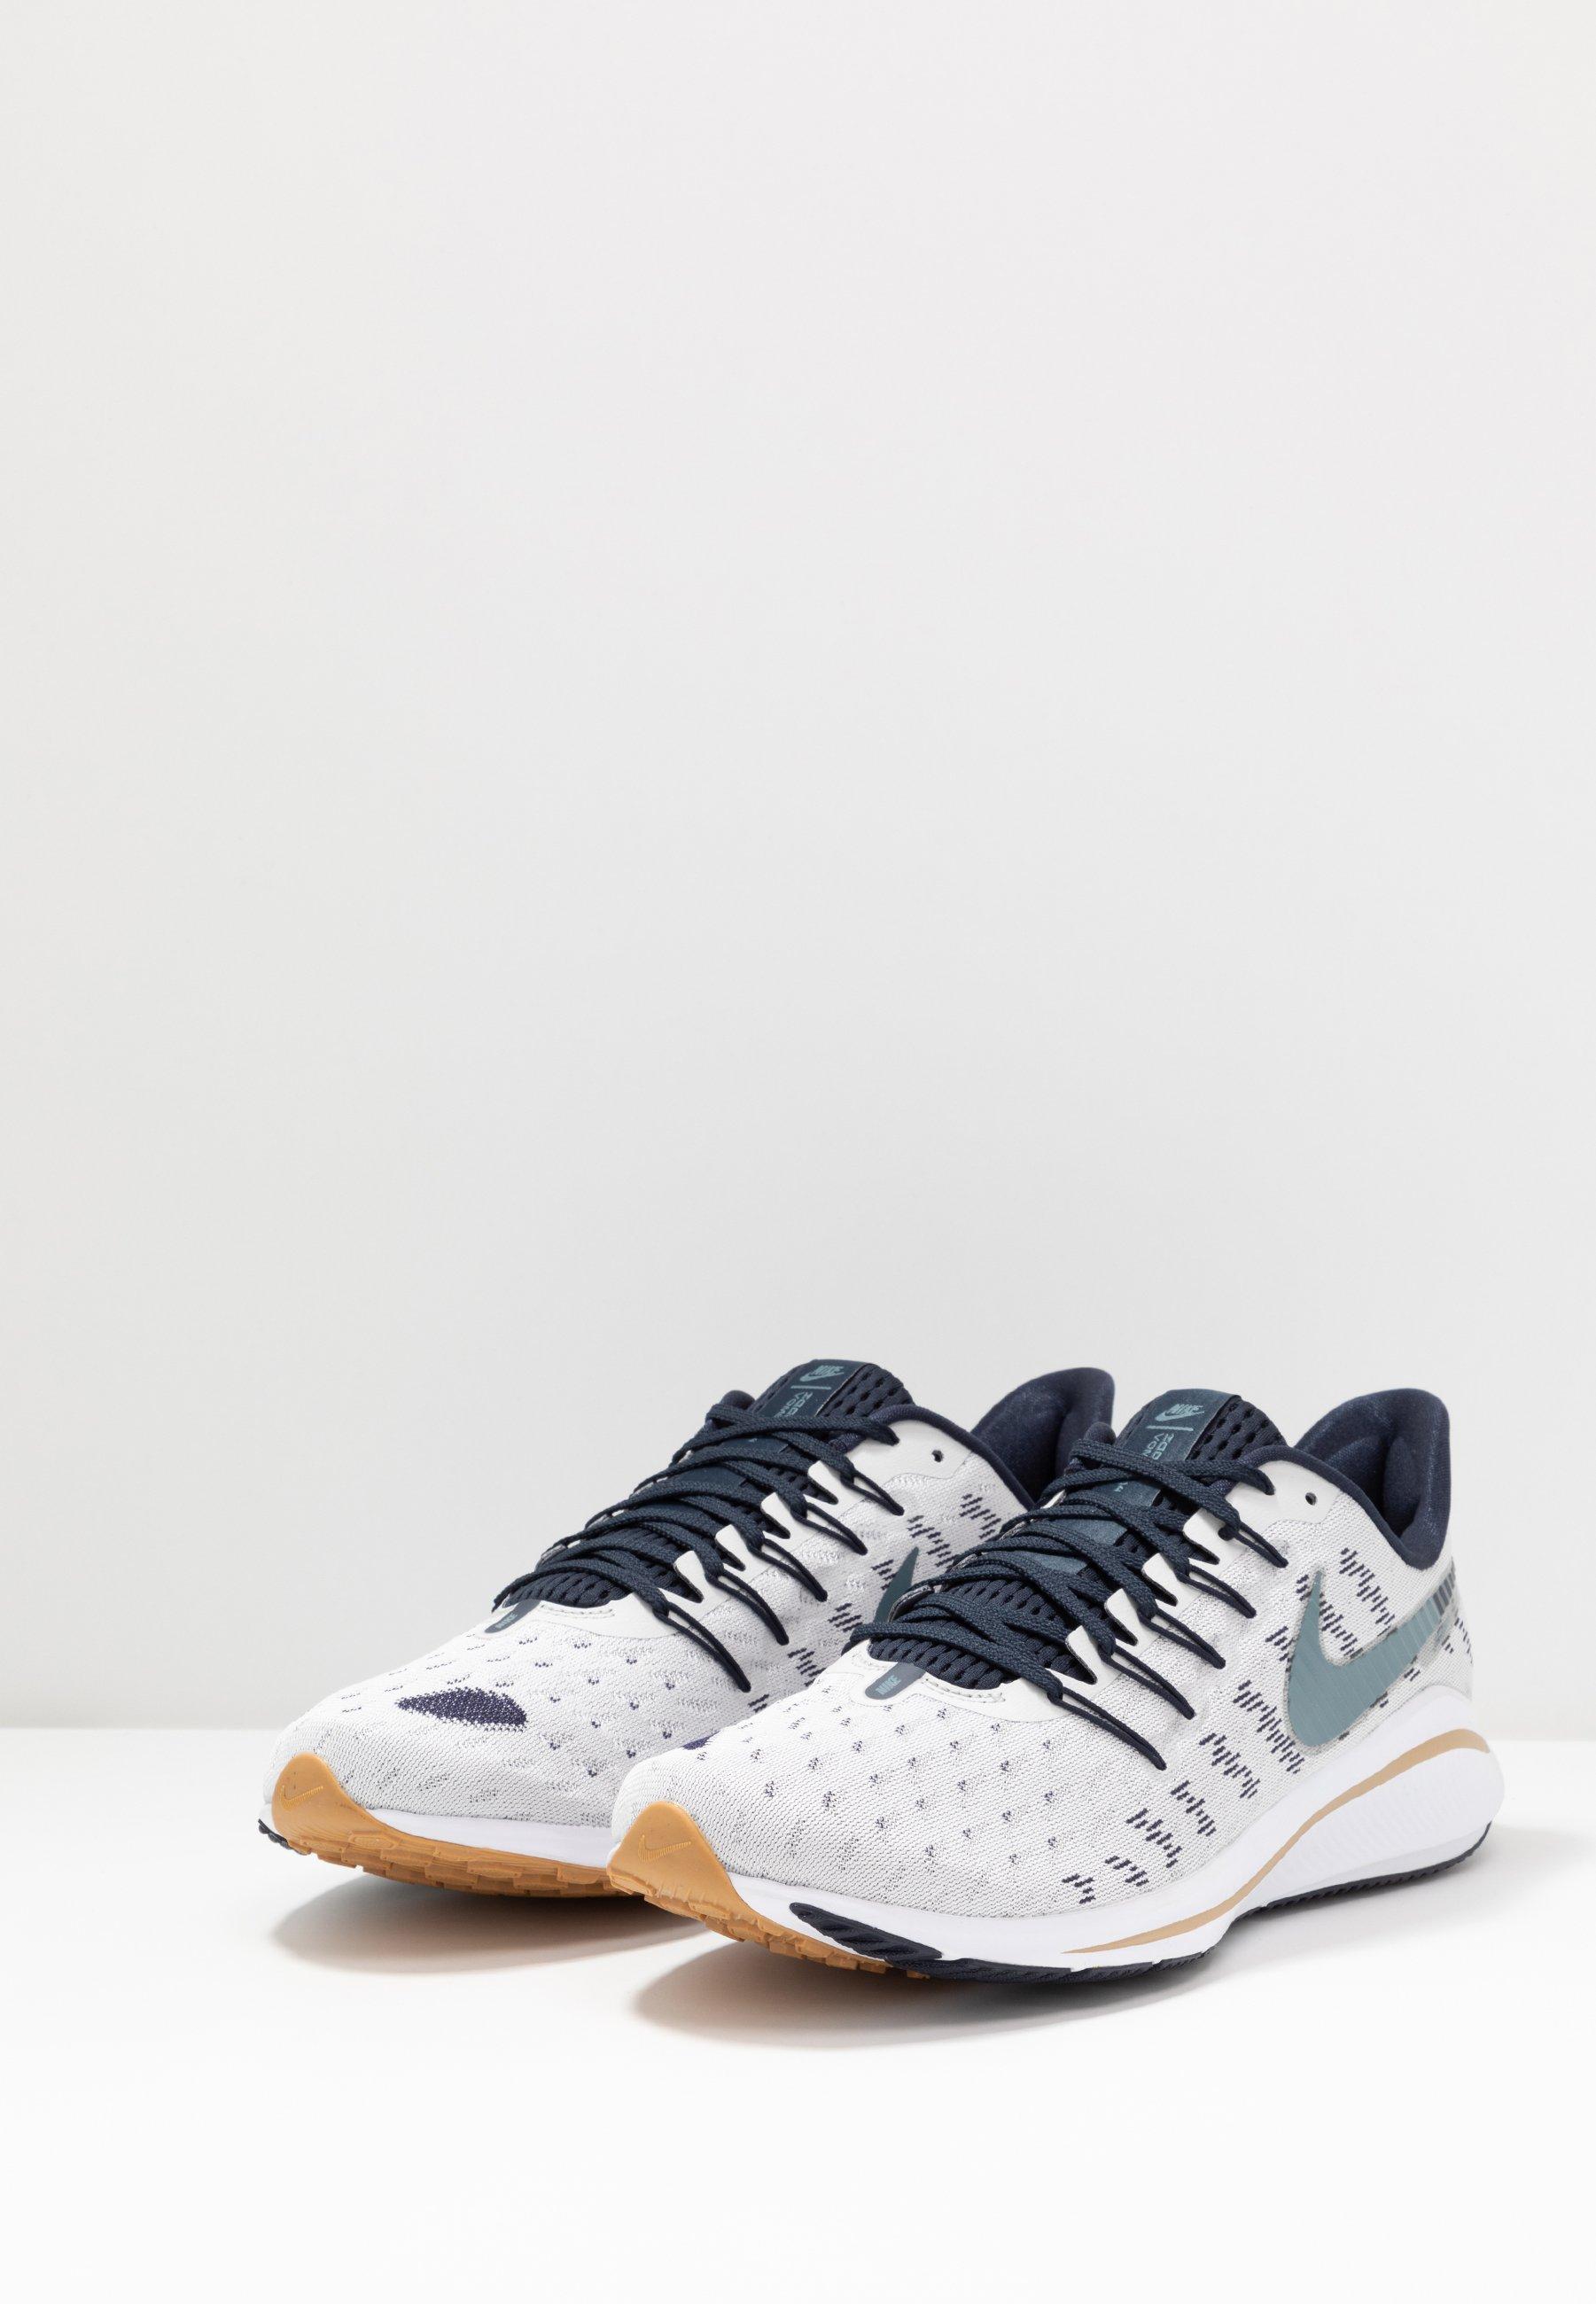 chaussures de running homme air zoom vomero 14 nike